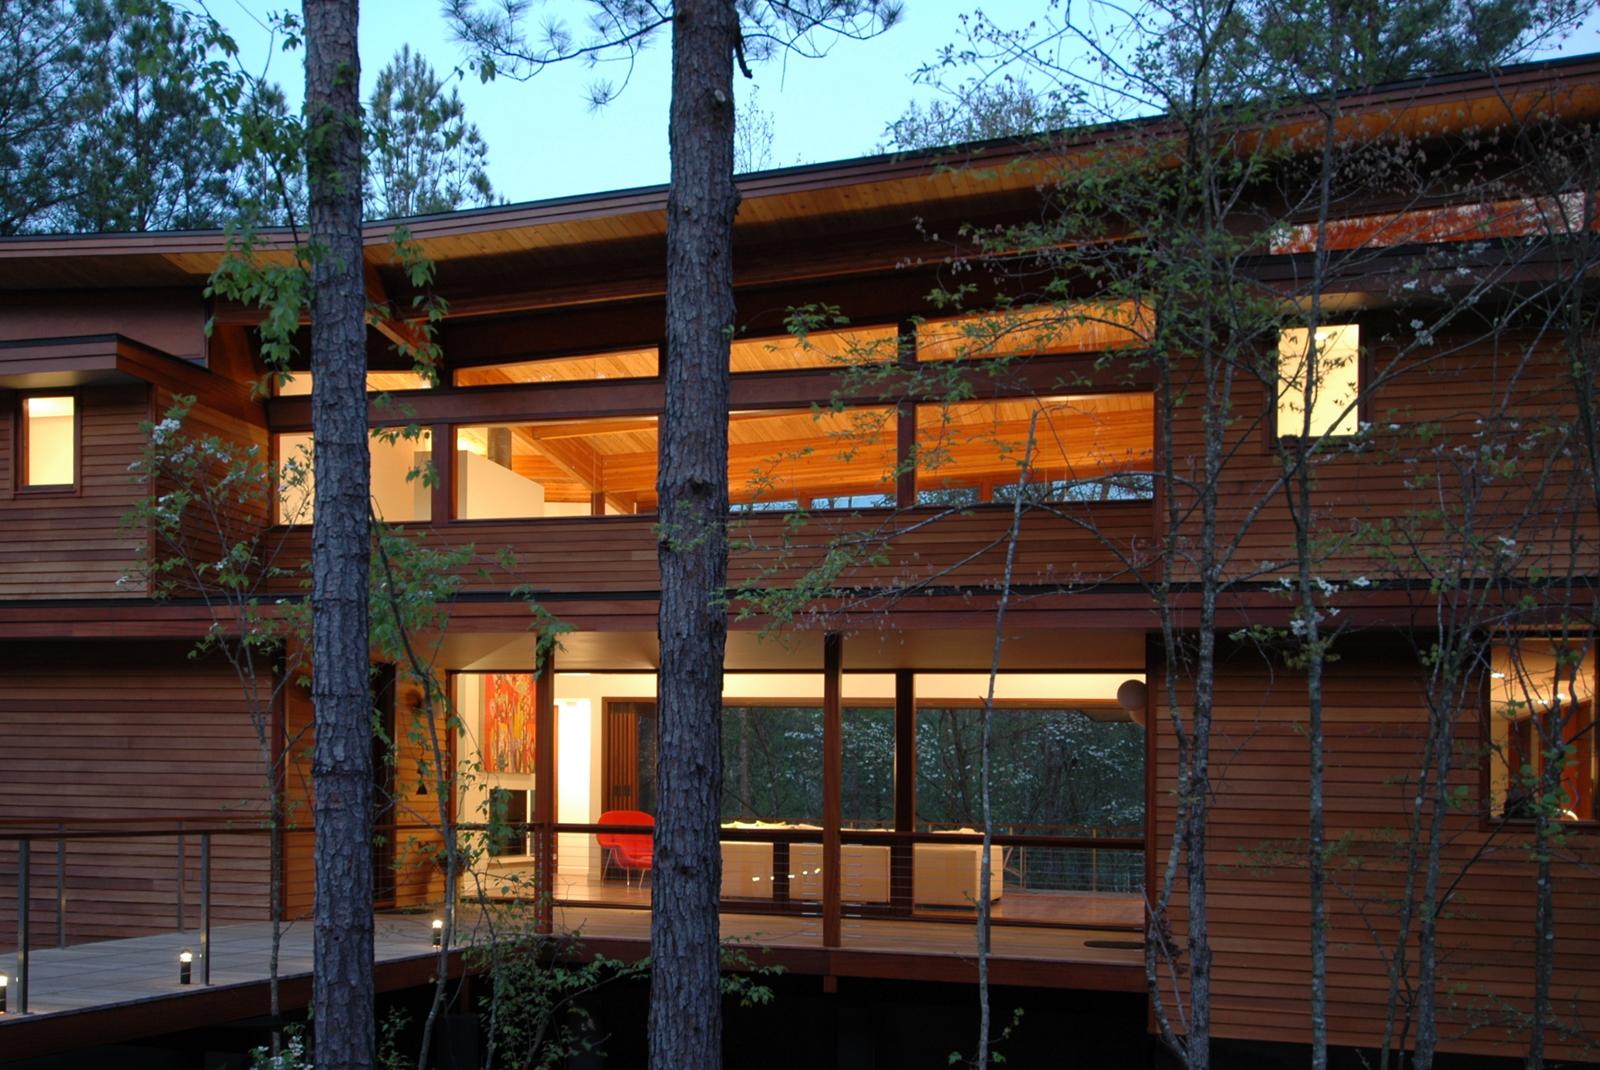 The Serenbe House in Palmetto, Georgia, by Joel Turkel Design.